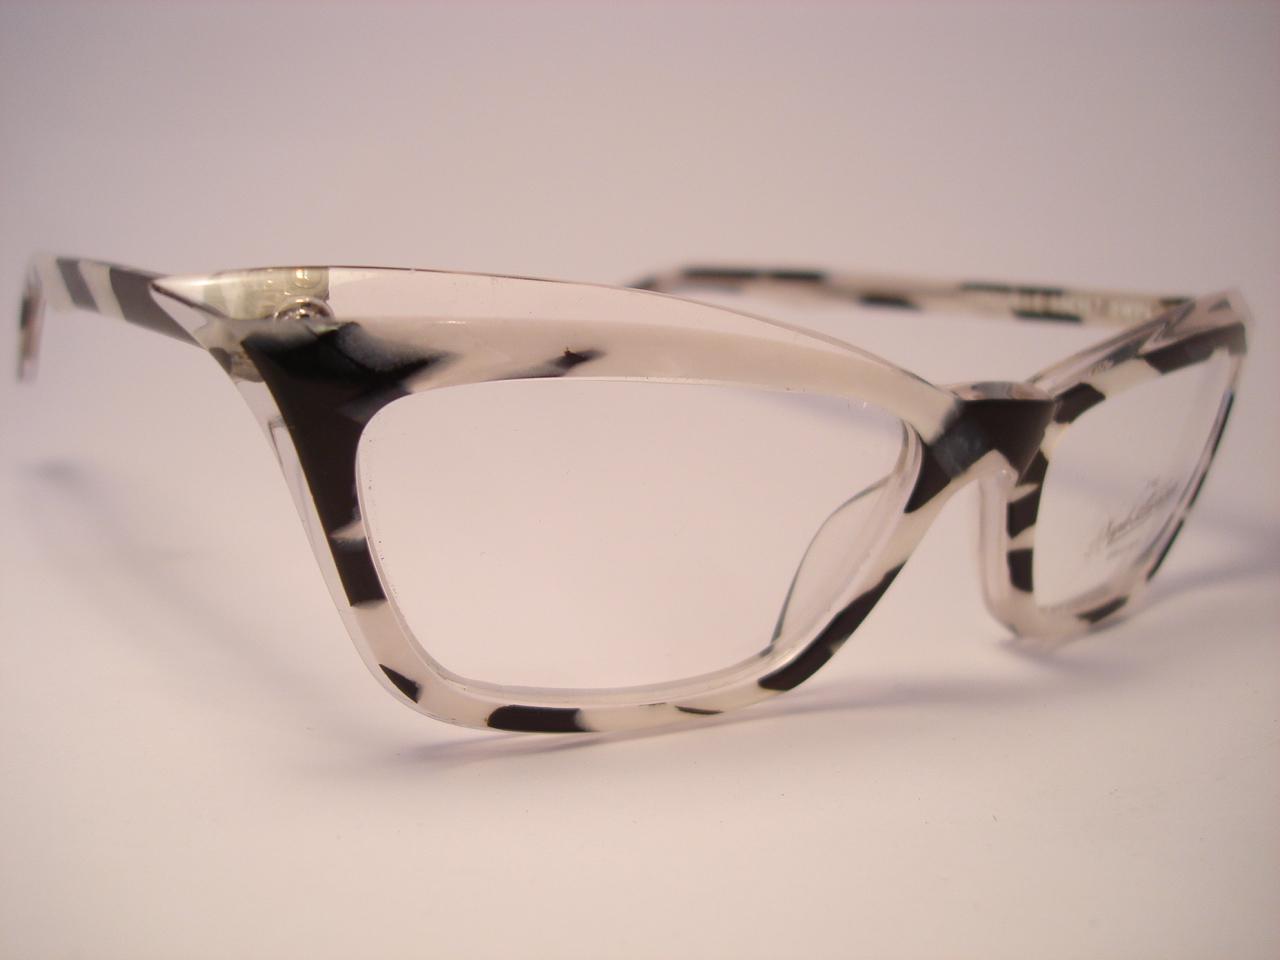 Zebra Eyeglass Frames : theothersideofthepillow: vintage ANGLO AMERICAN EYEWEAR ...